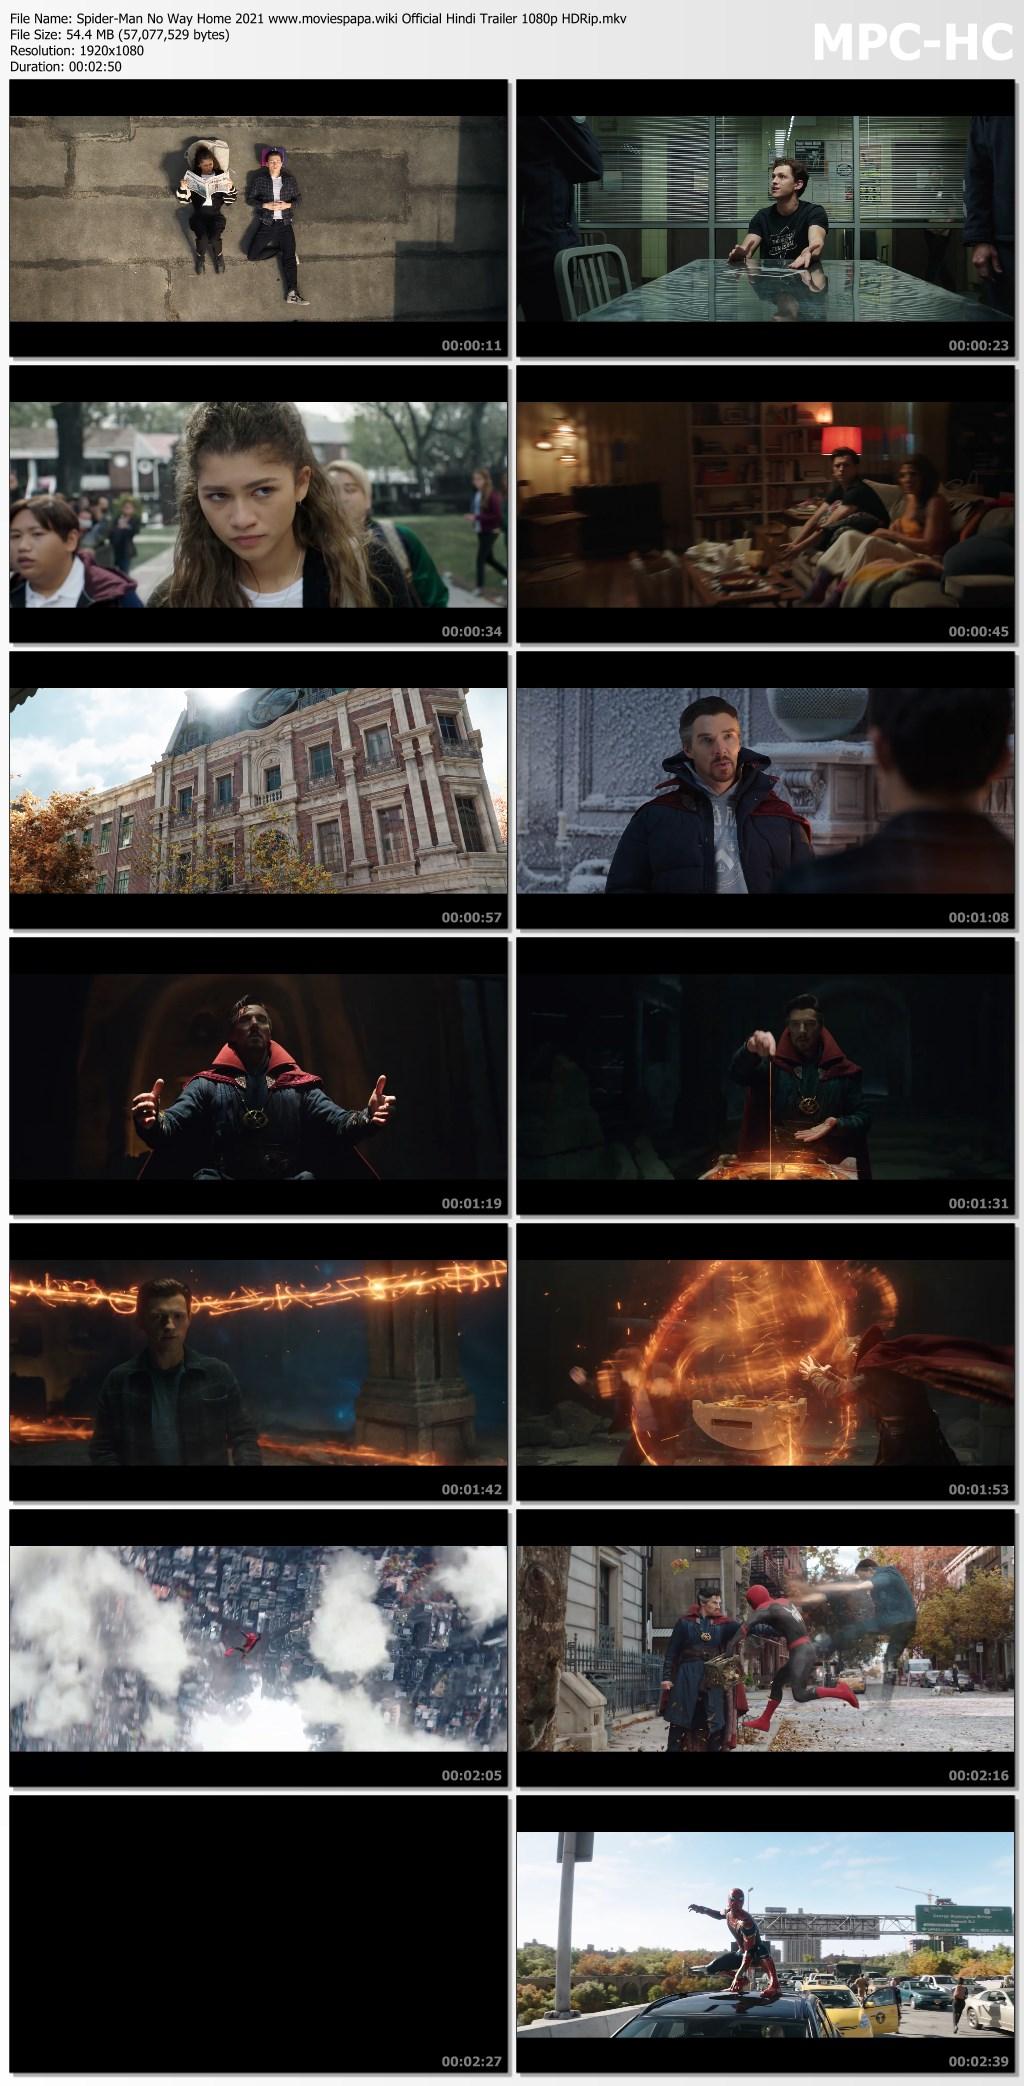 Spider-Man No Way Home 2021 screenshot HDMoviesFair